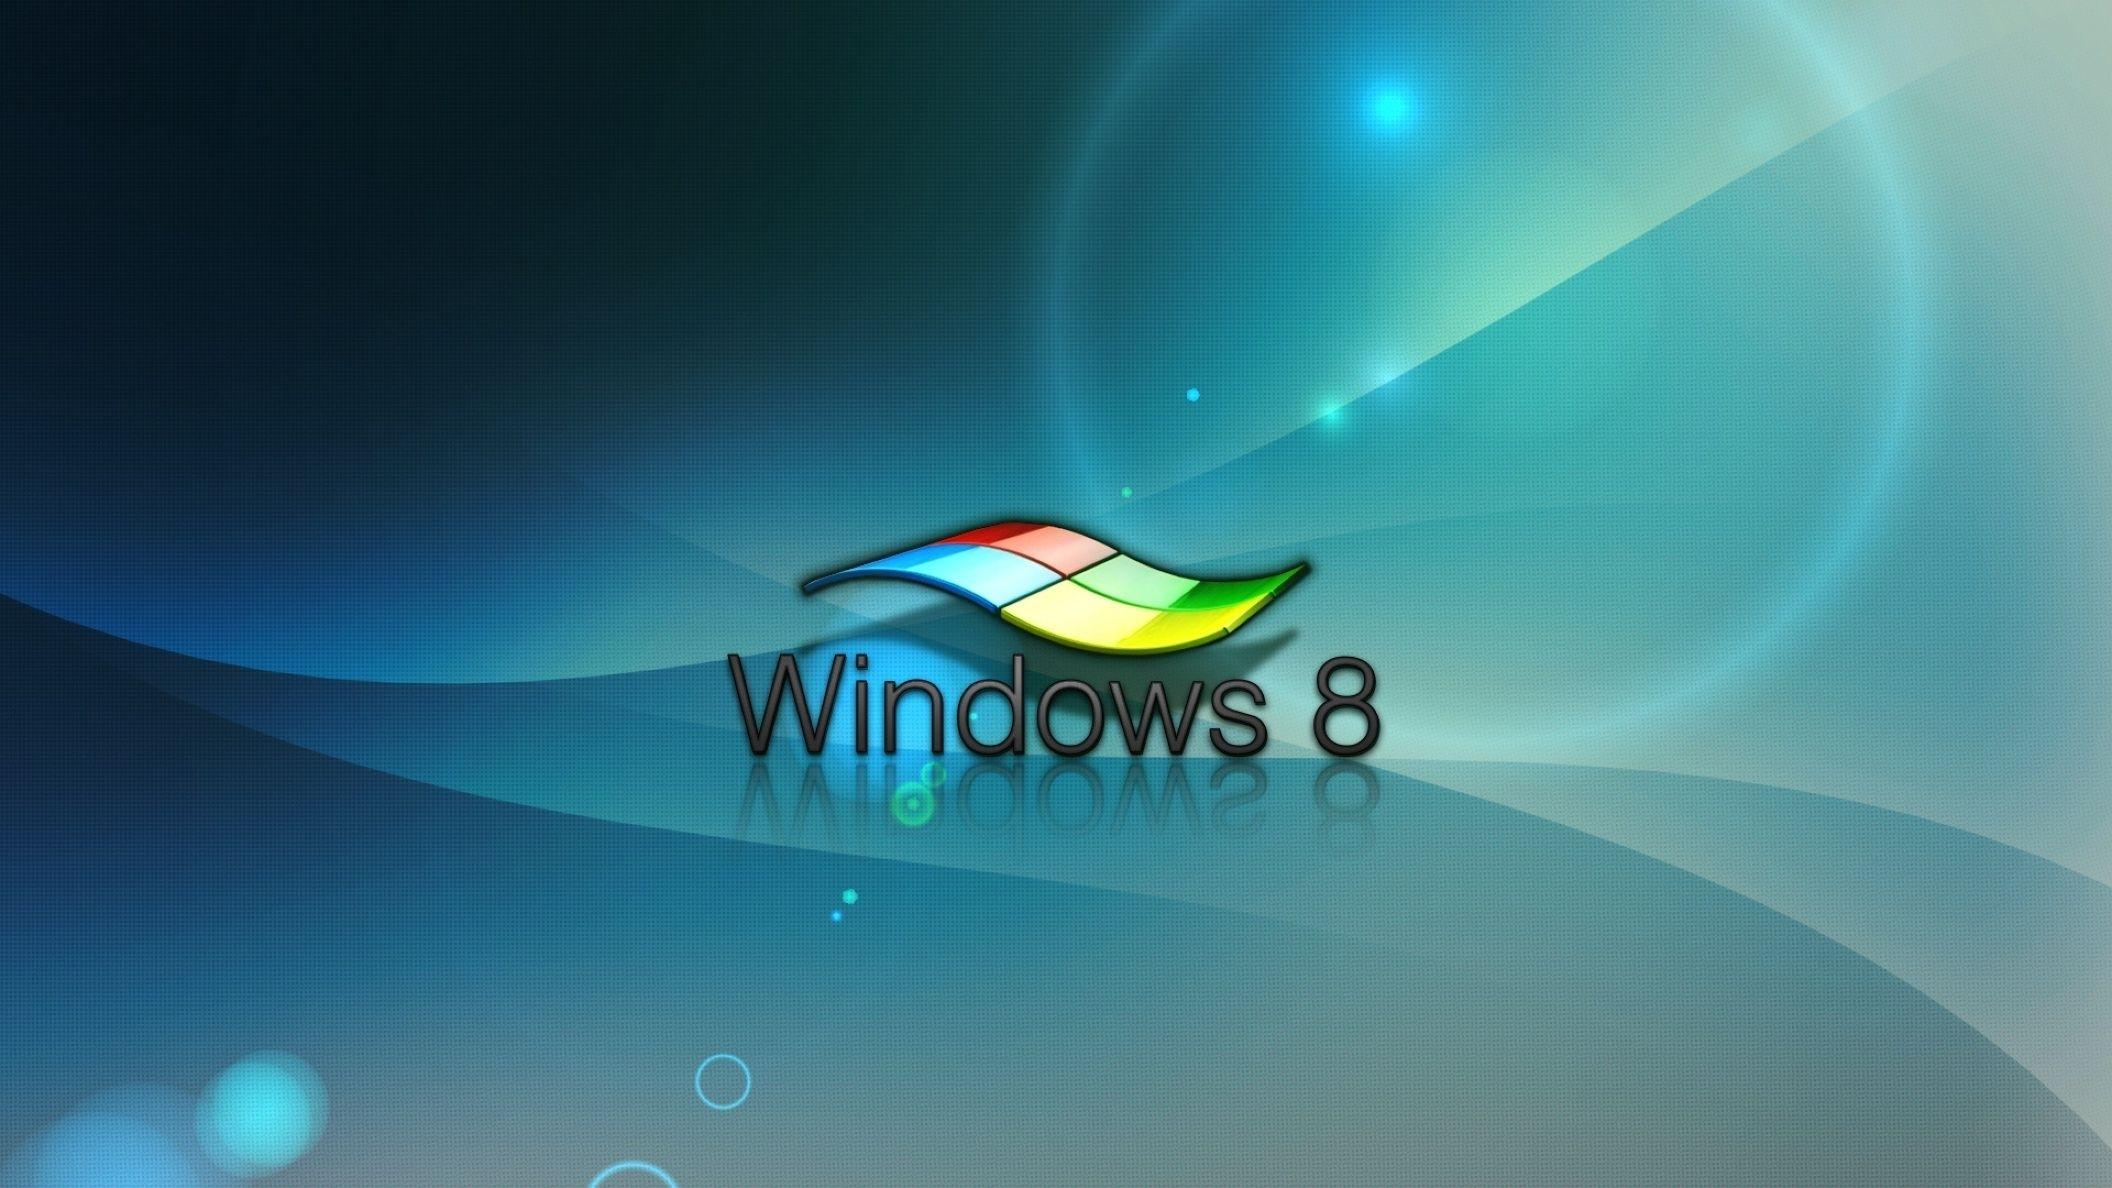 10 Most Popular Windows 8 Wallpaper Hd 3D For Desktop FULL HD 1920x1080 DOWNLOAD